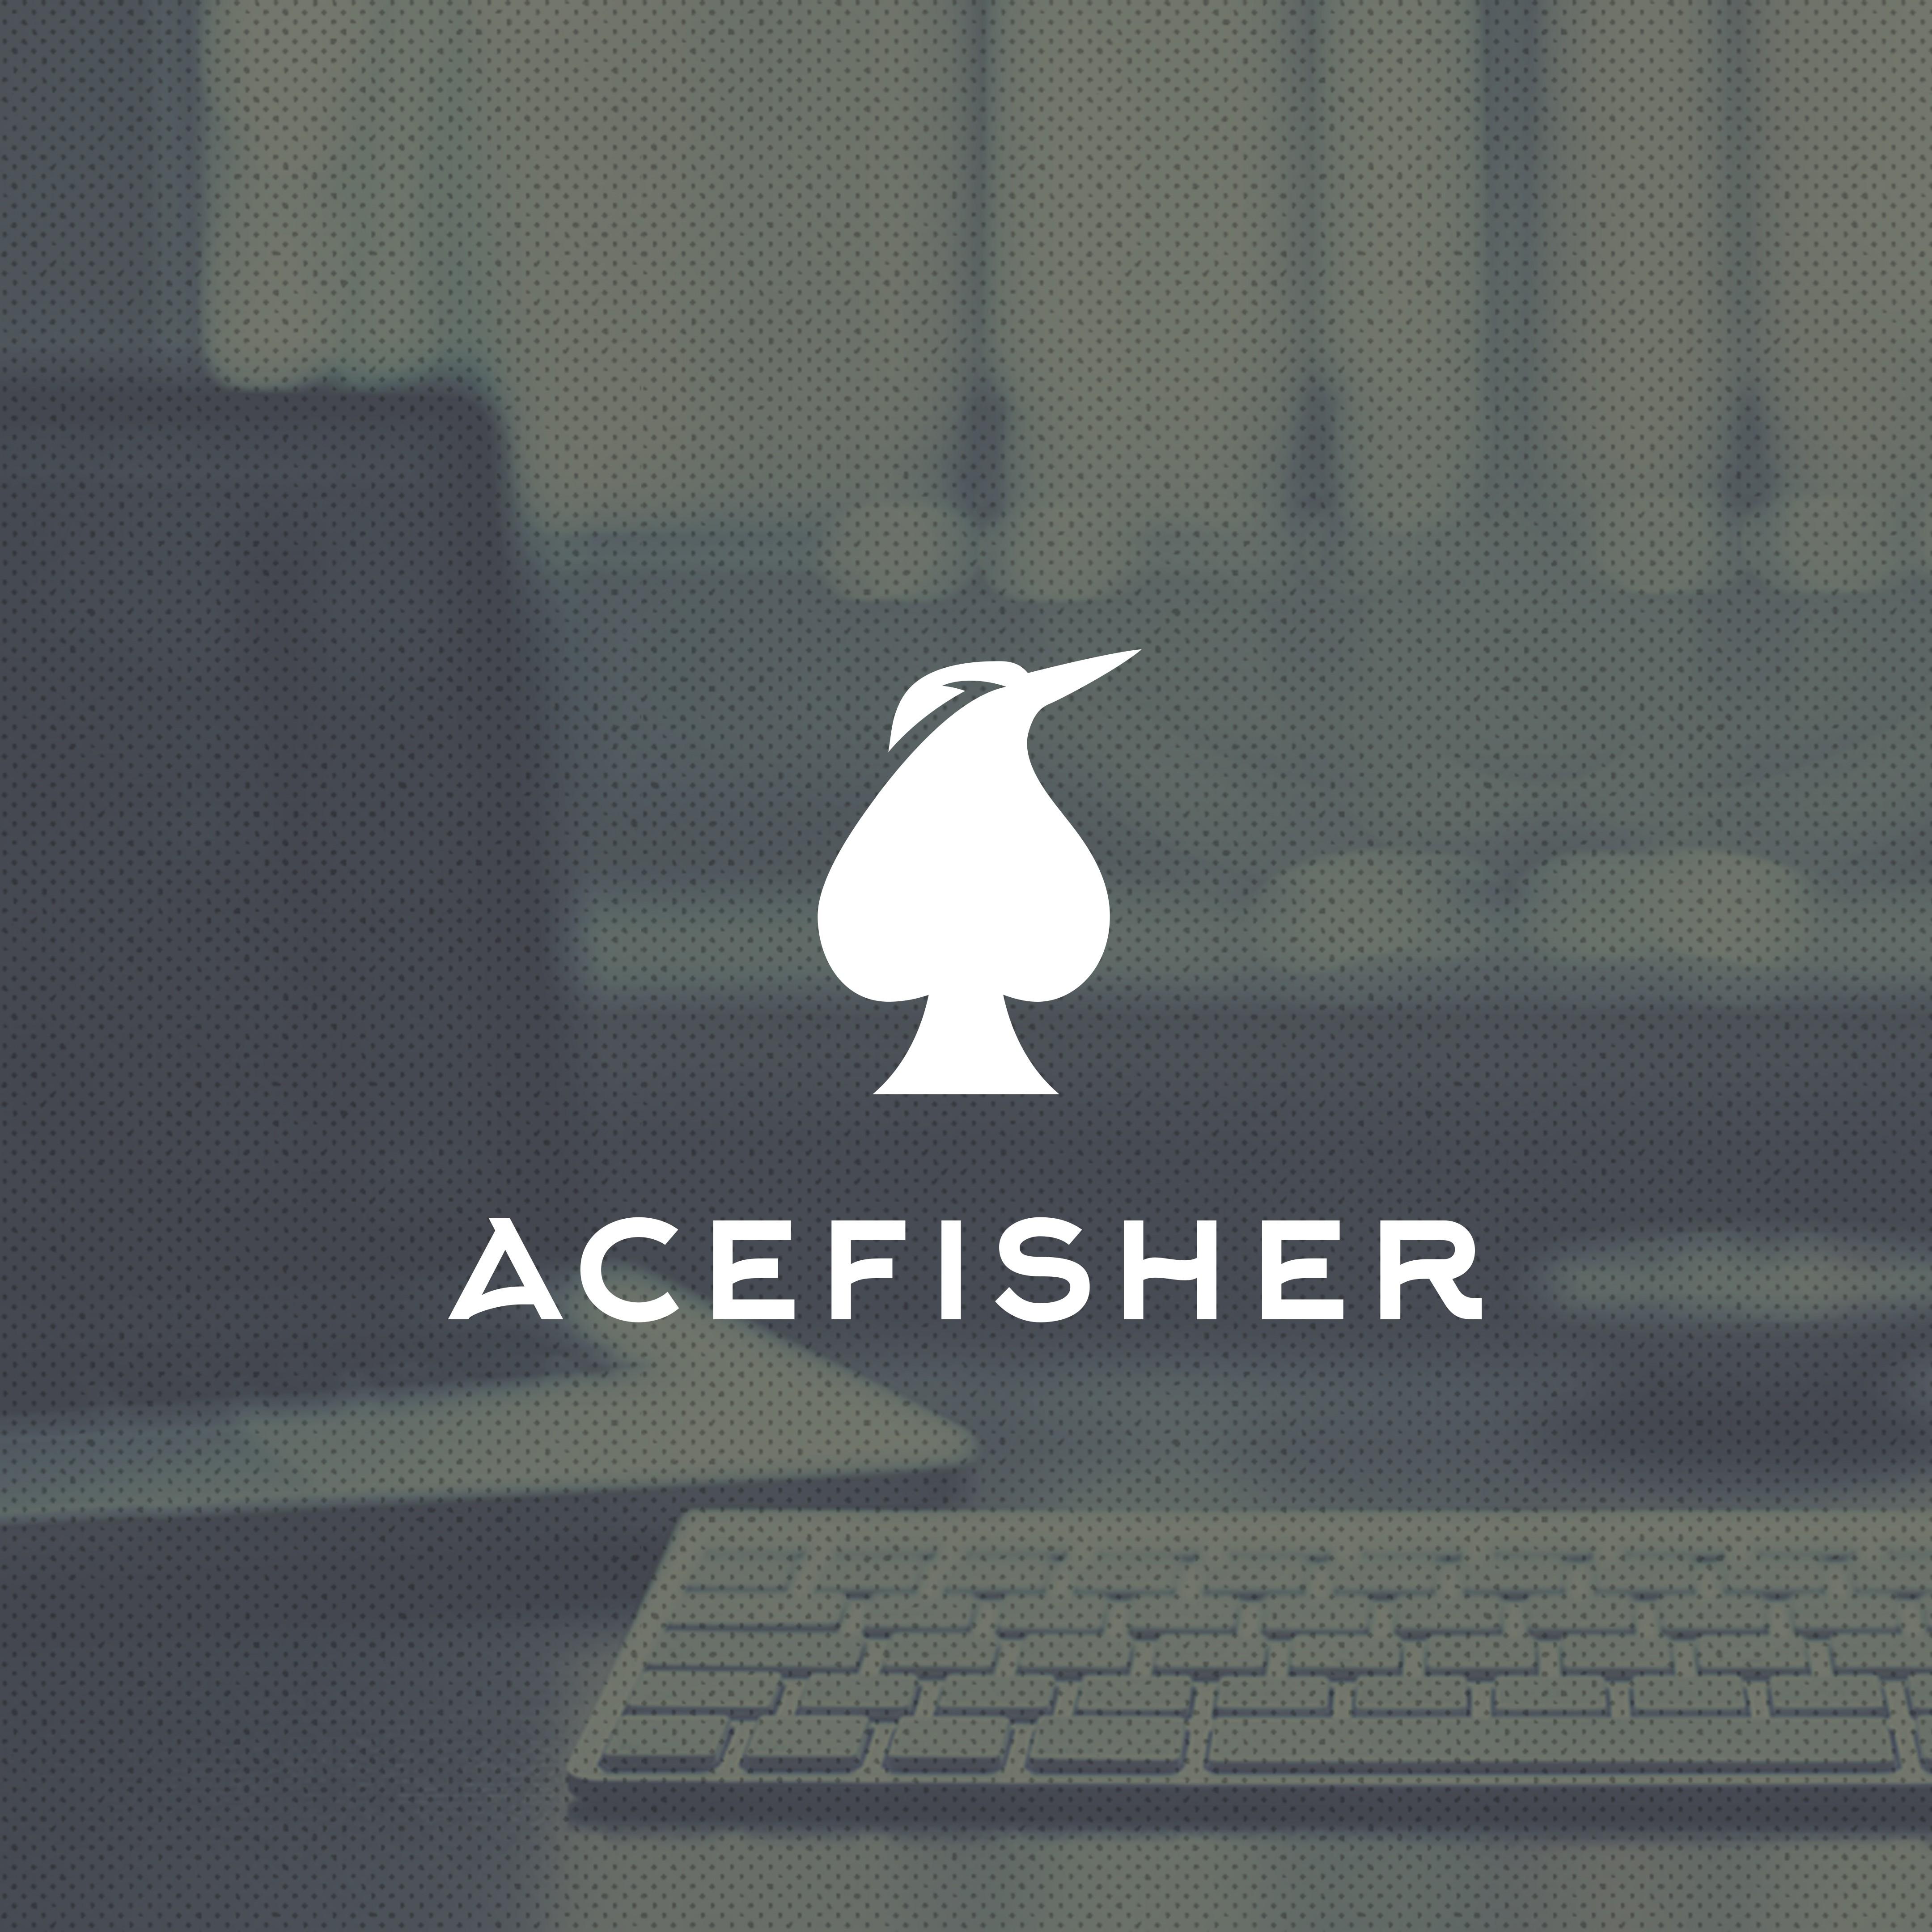 Create a logo for a digital marketing agency AceFisher